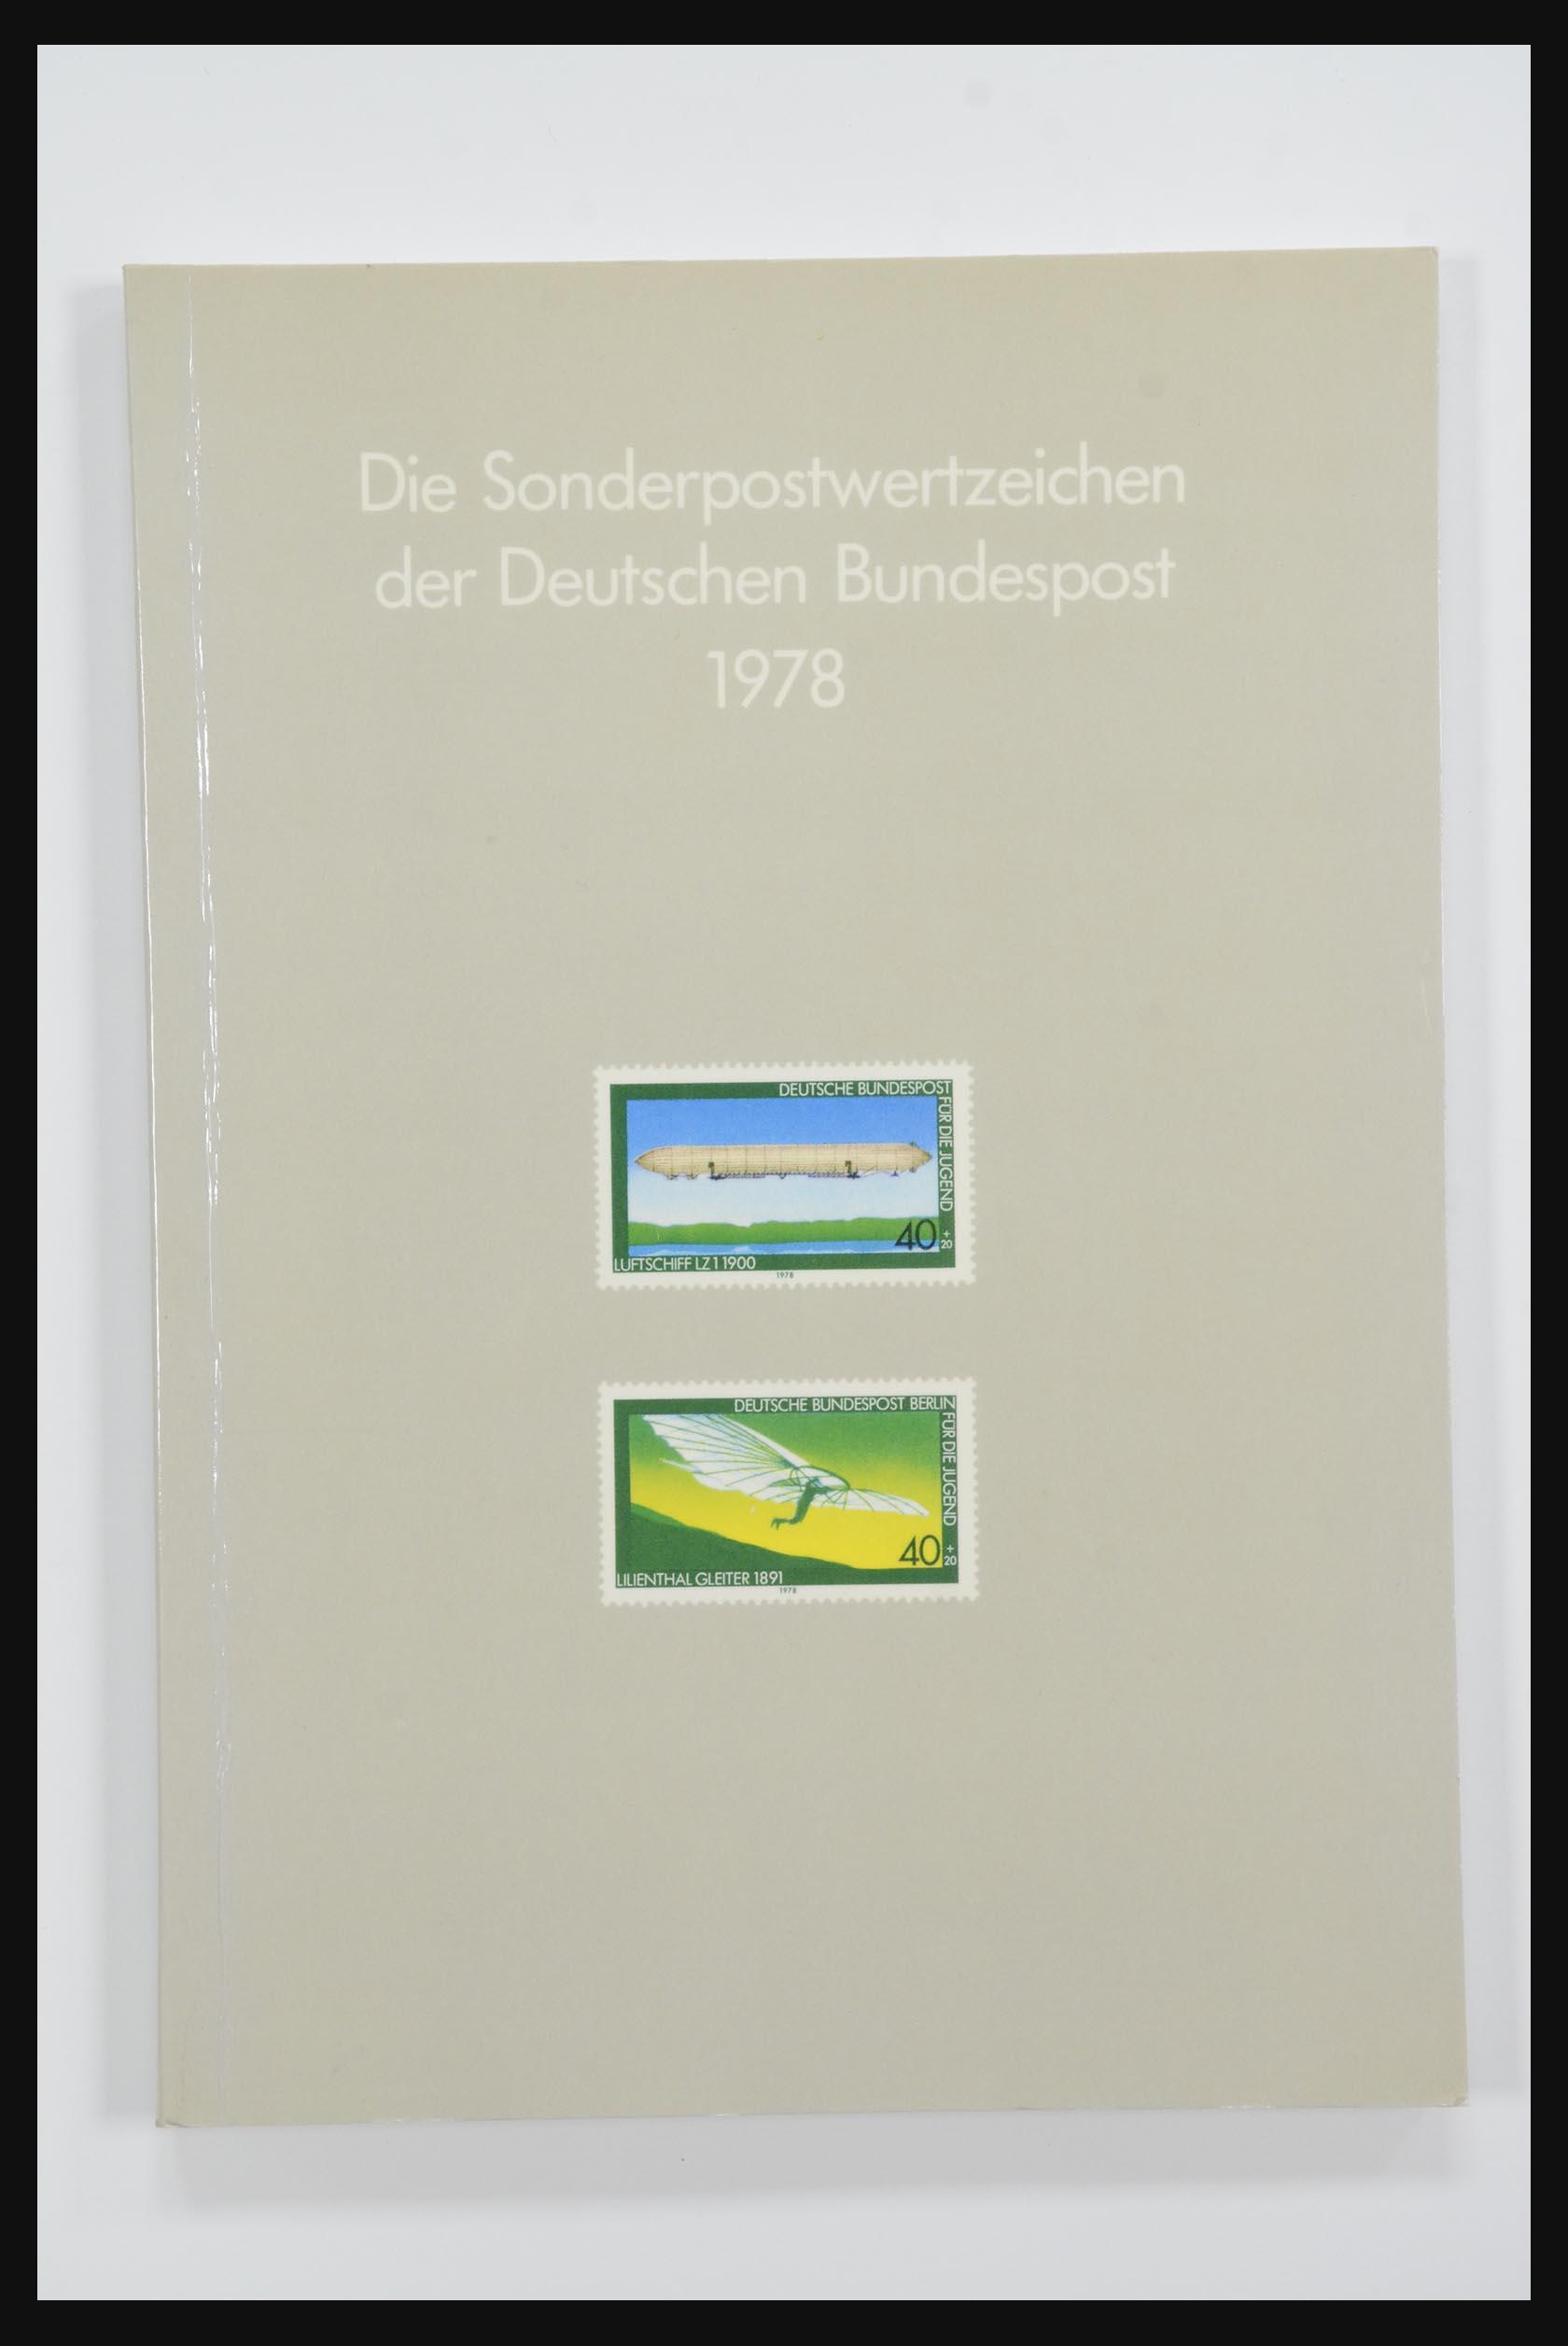 31834 006 - 31834 Bundespost yearbooks 1973(!)-1999.